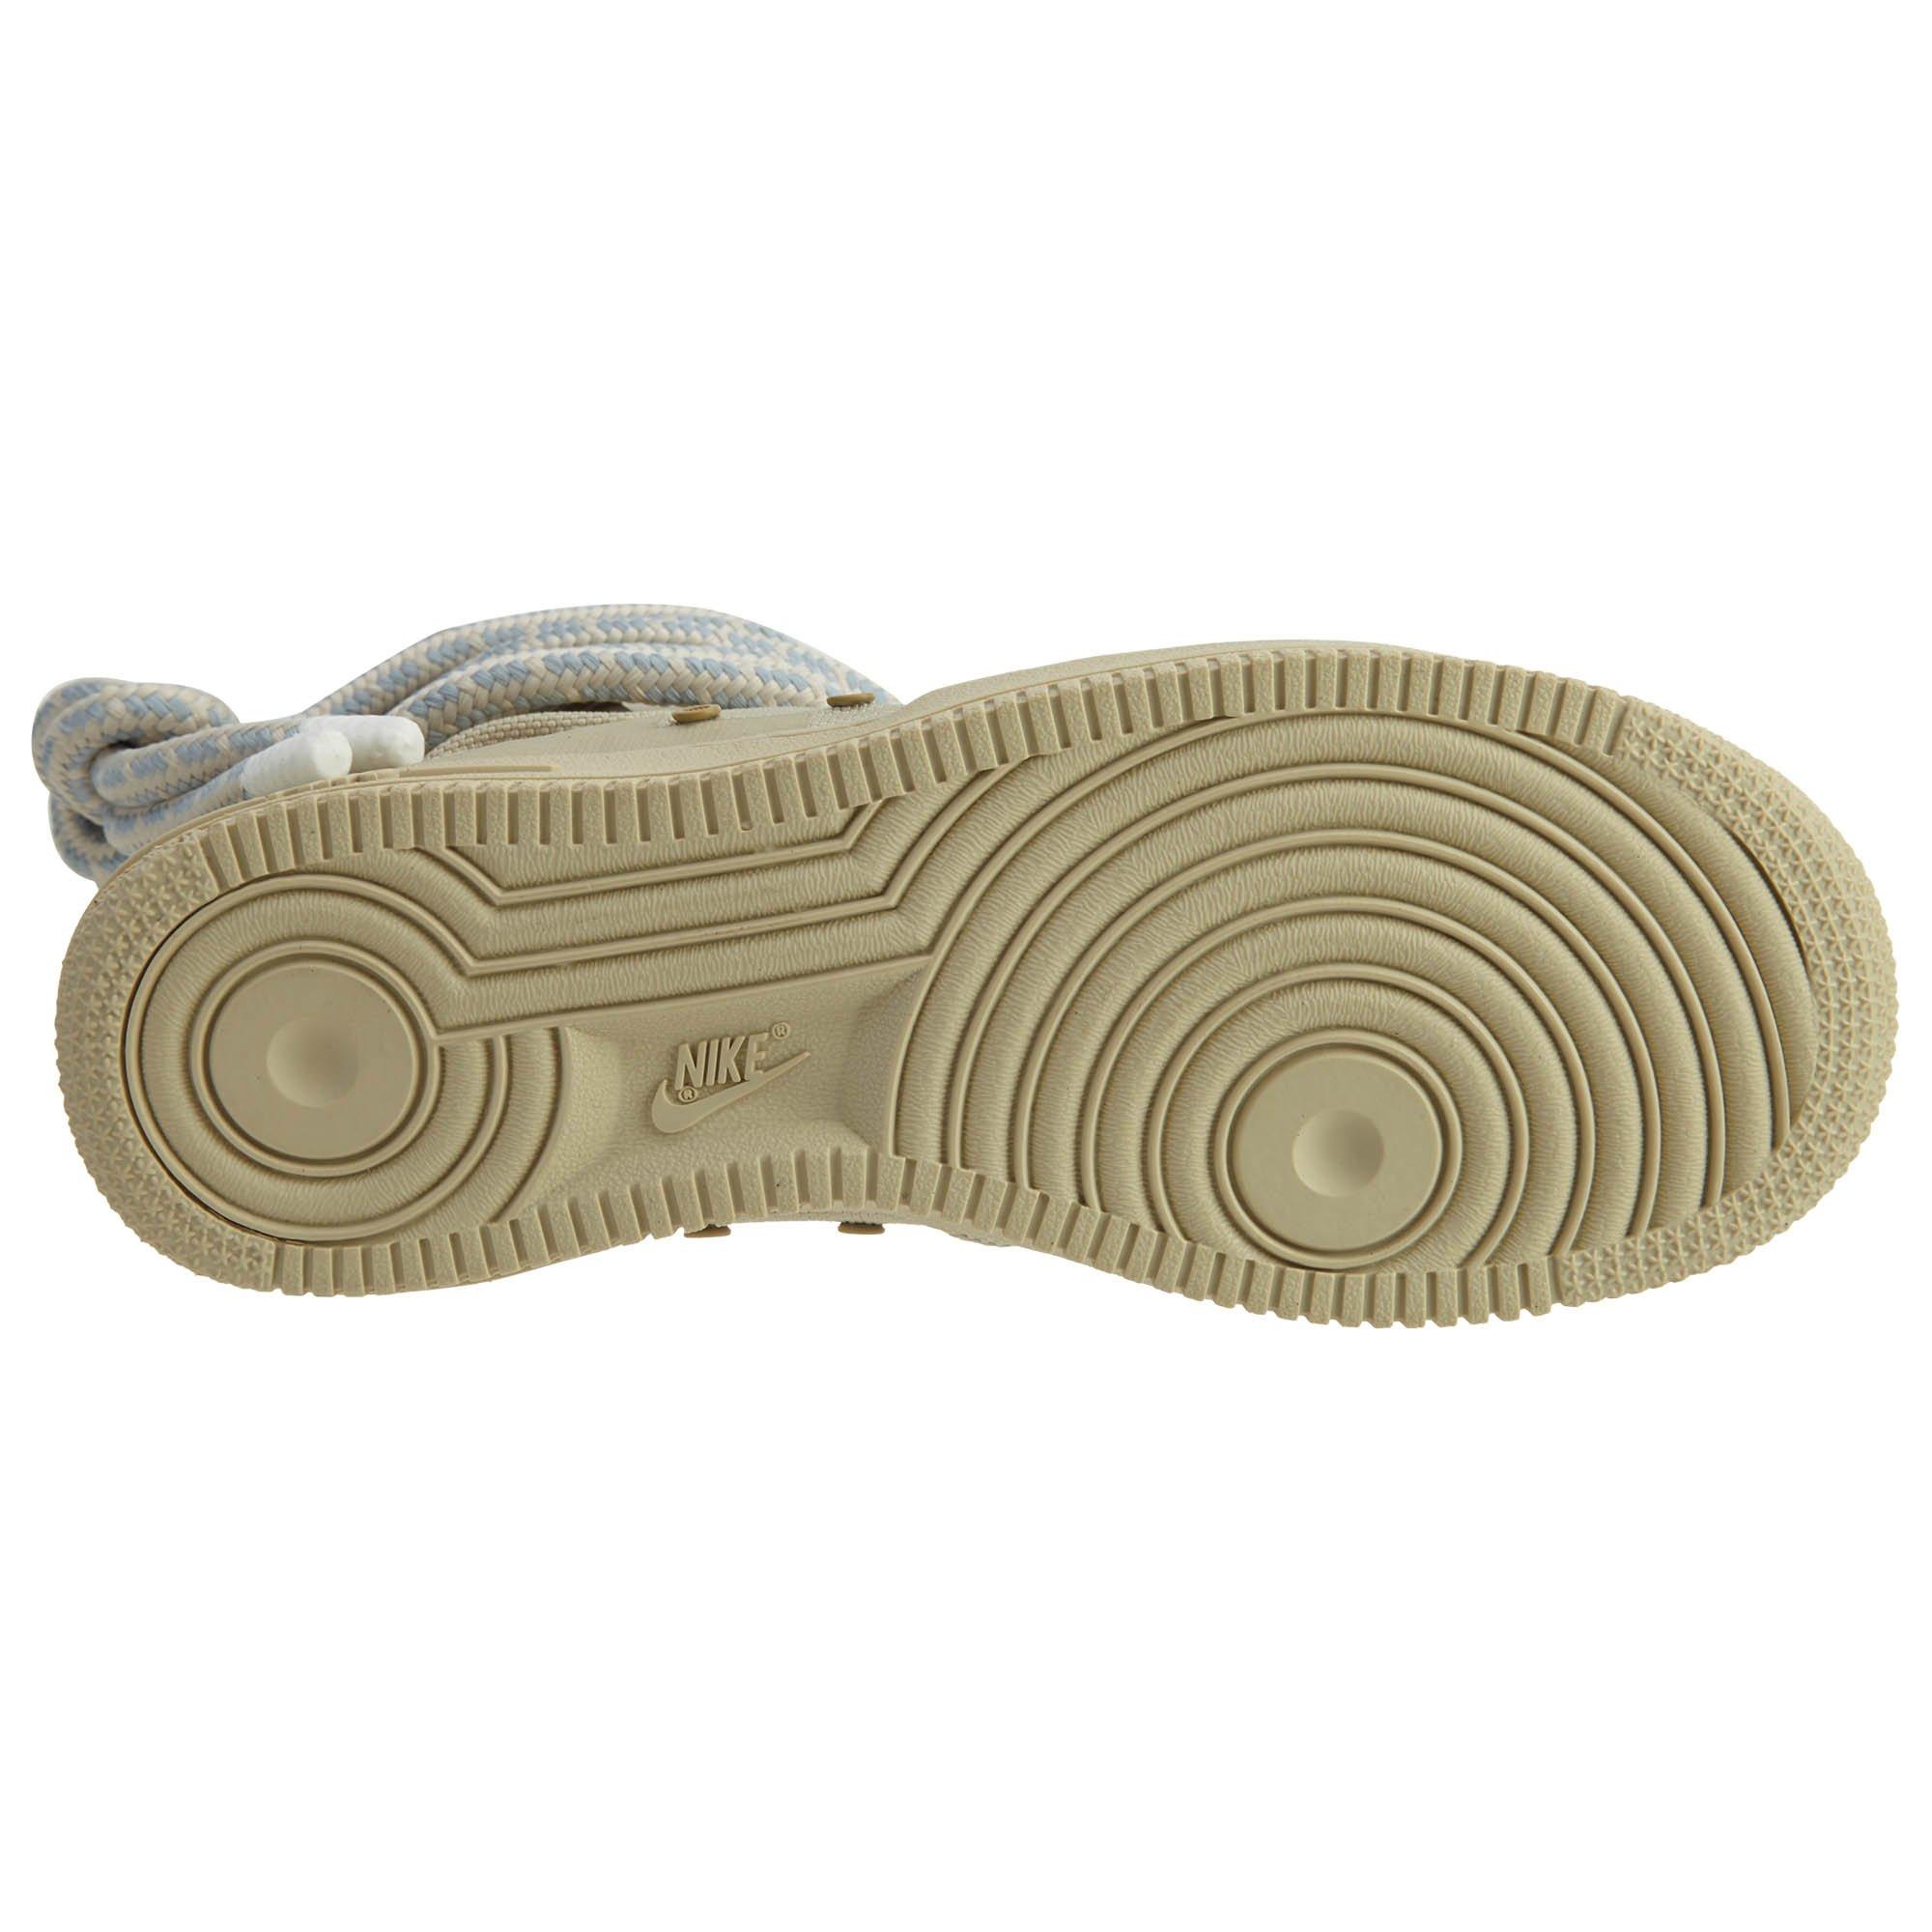 Nike Sf Af1 Hi Womens Style : AA3965-200 Size : 8.5 B(M) US by NIKE (Image #7)